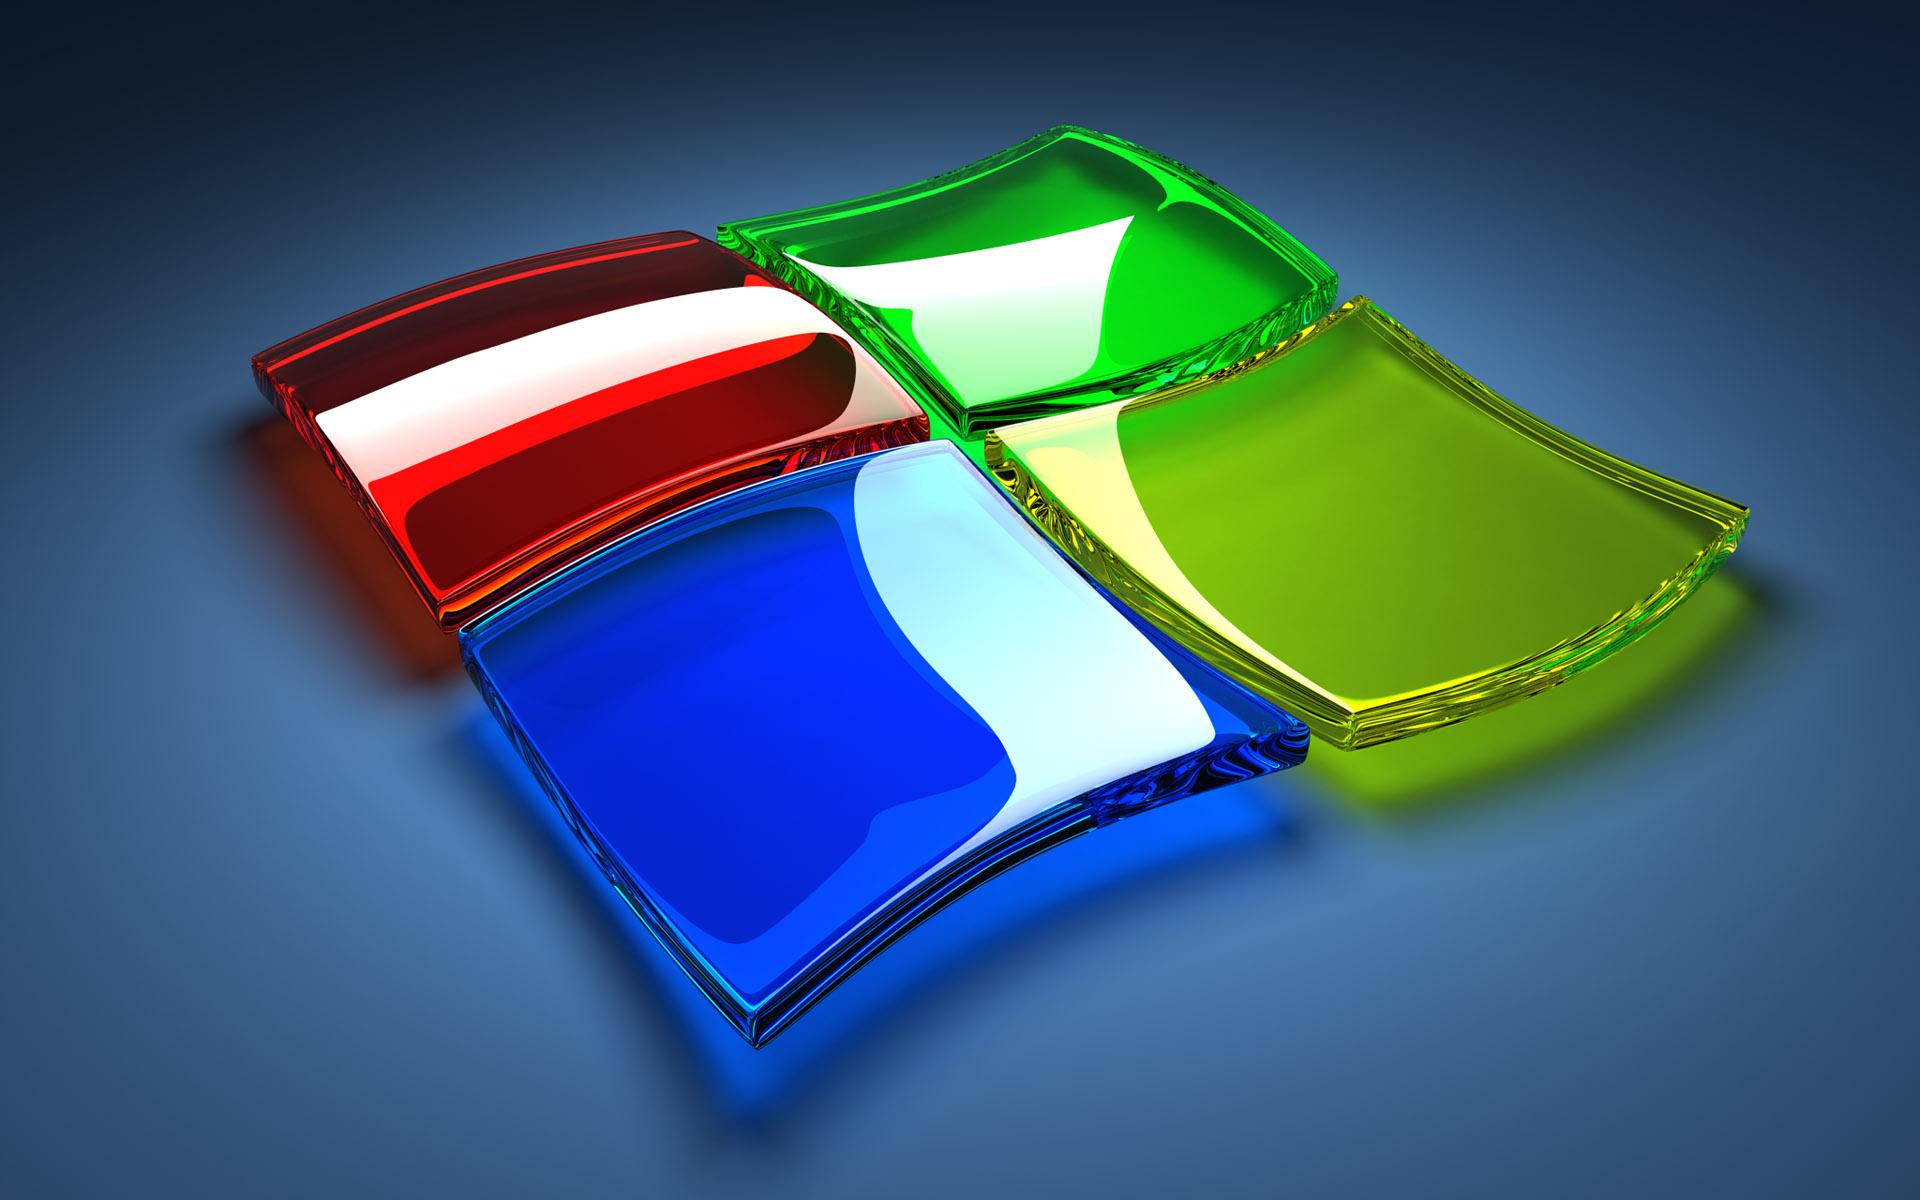 Windows Logo Desktop wallpapers 1920x1200 1920x1200